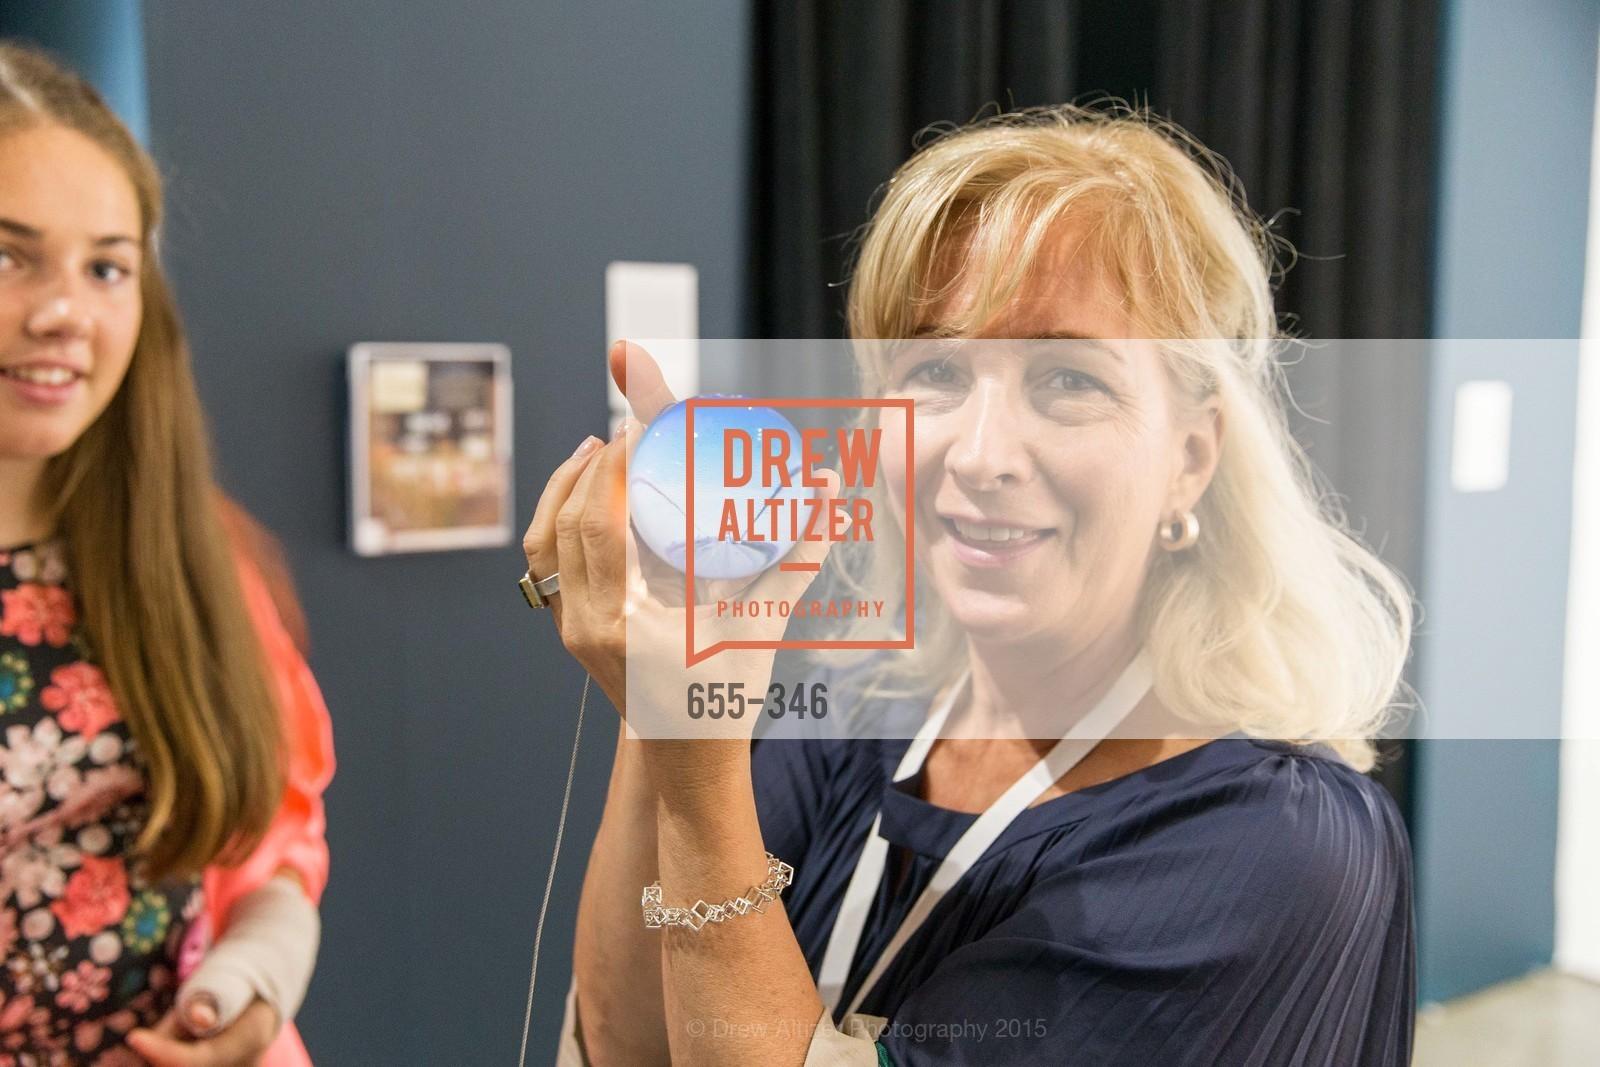 Allison Lipe-Cross, Art Miami Presents: Art Silicon Valley, San Mateo County Event Center. 1346 Saratoga Dr, October 8th, 2015,Drew Altizer, Drew Altizer Photography, full-service event agency, private events, San Francisco photographer, photographer California